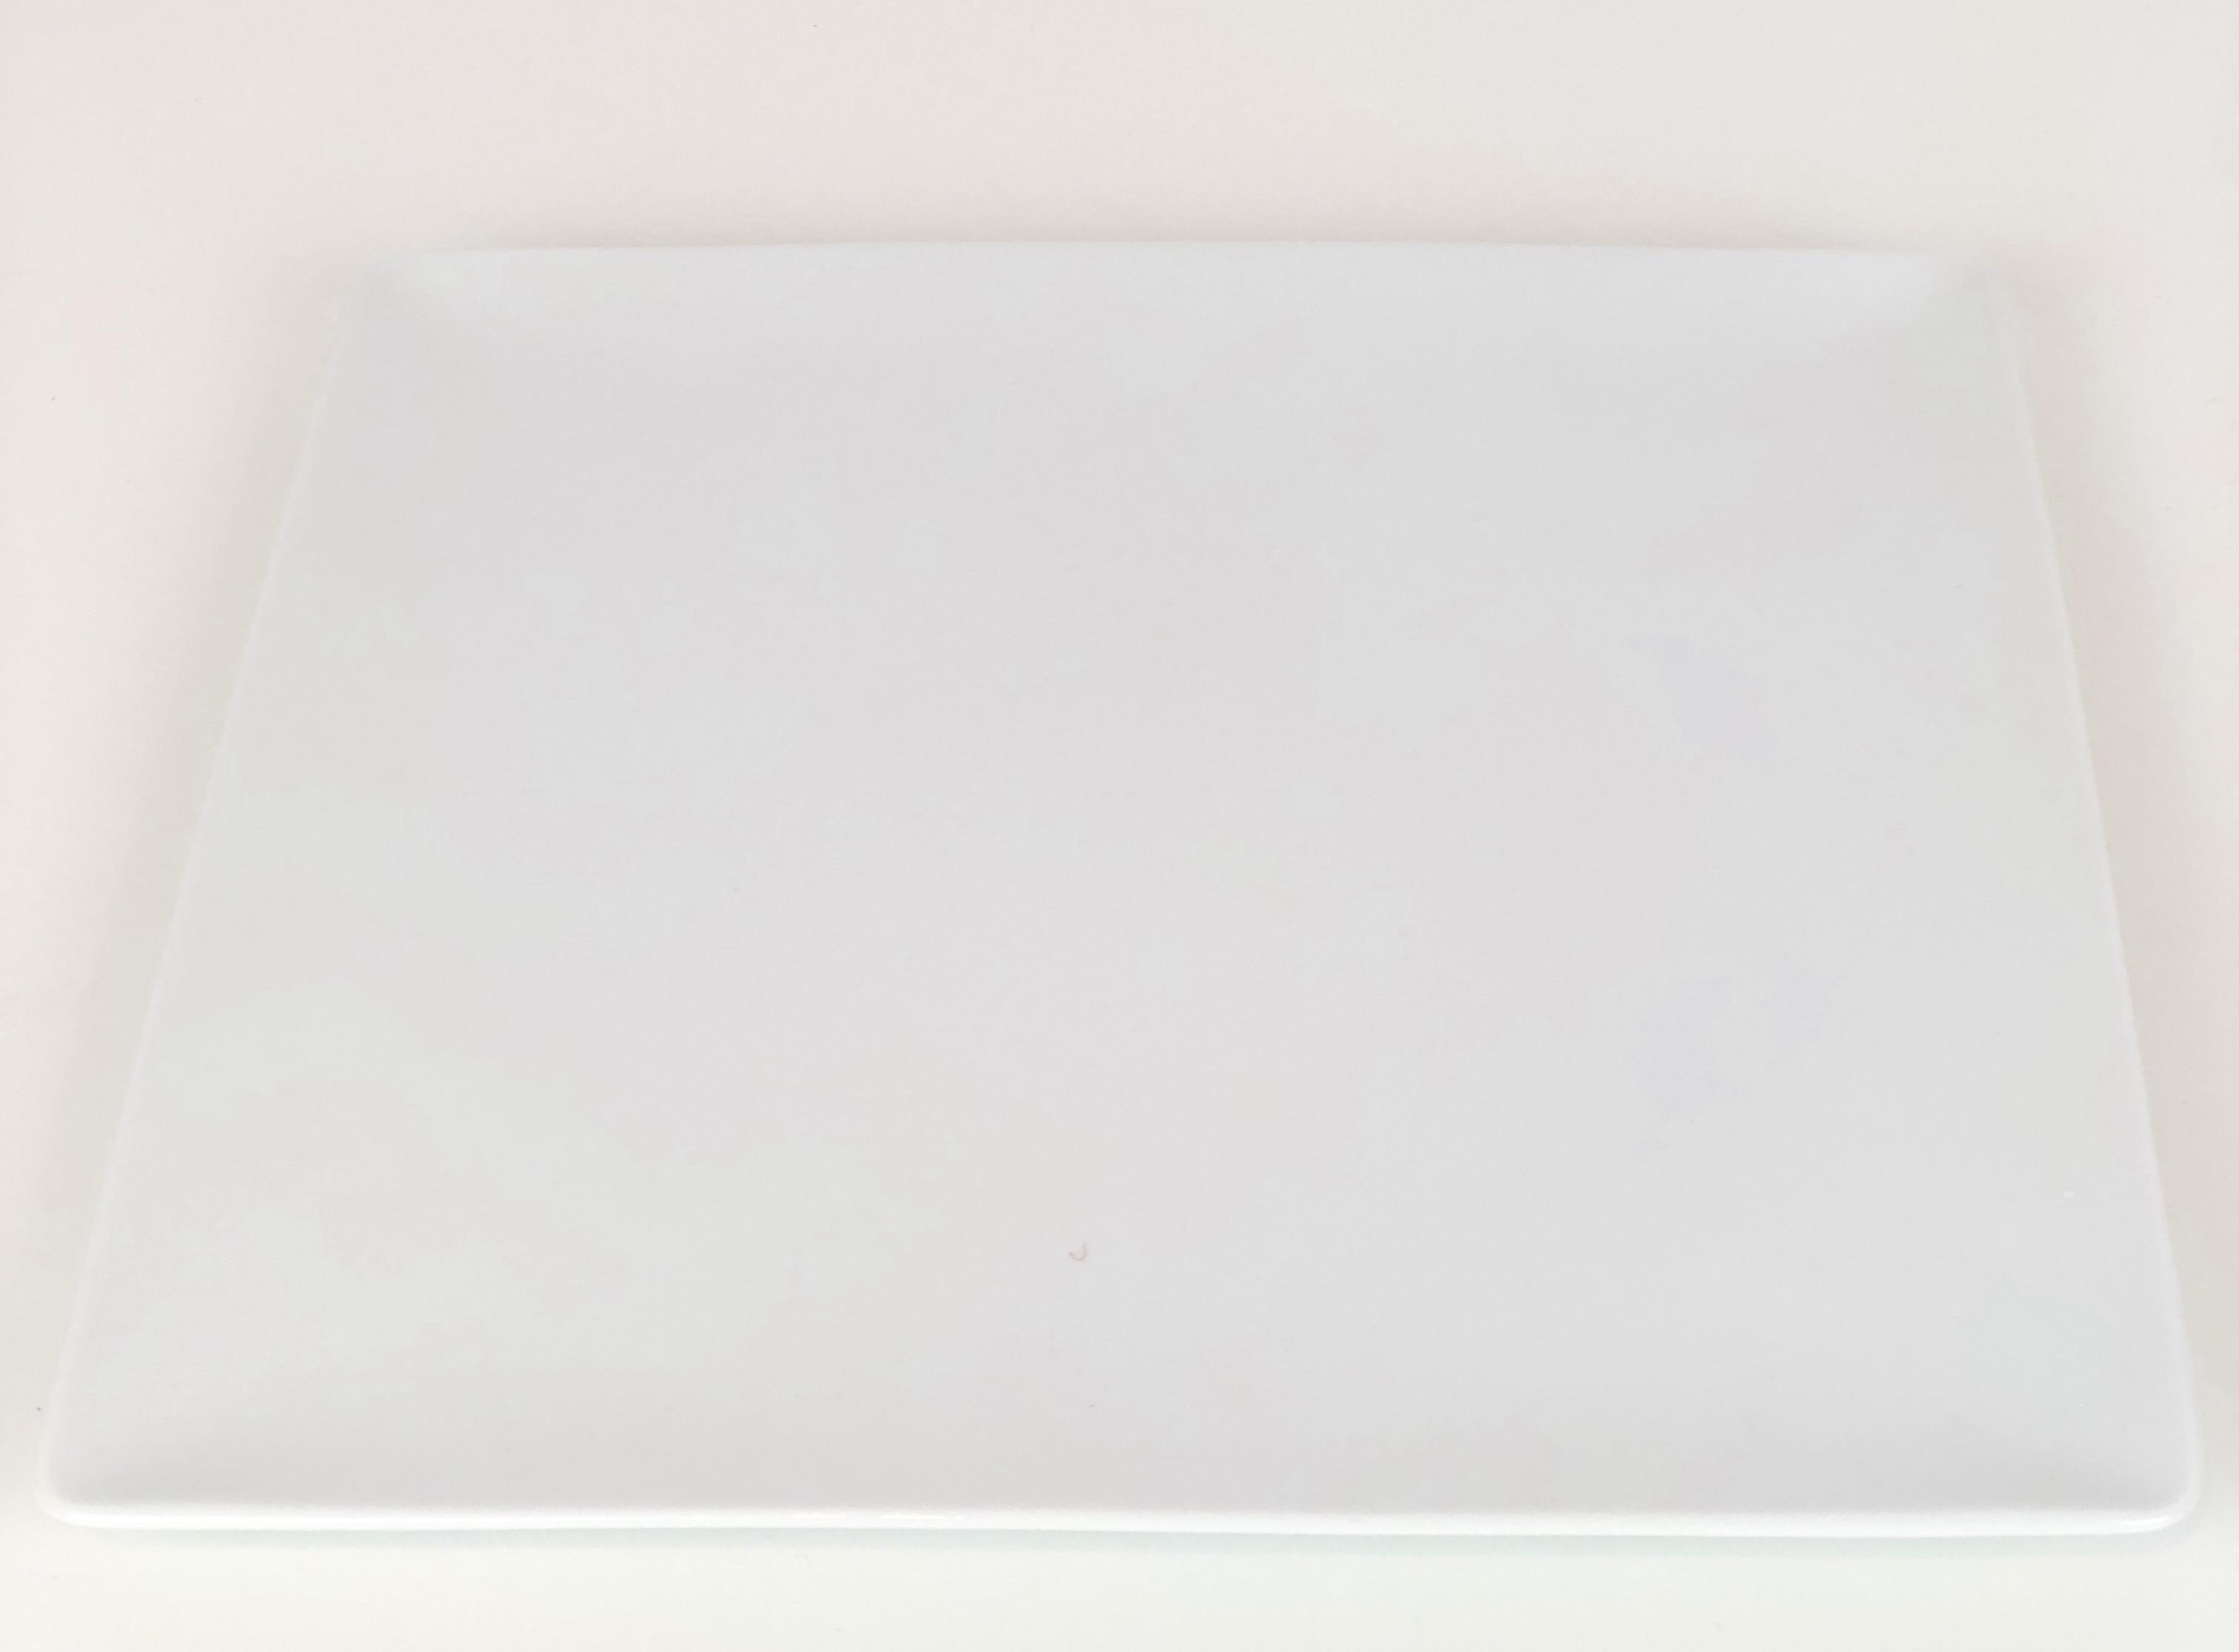 Flat White Square Plate